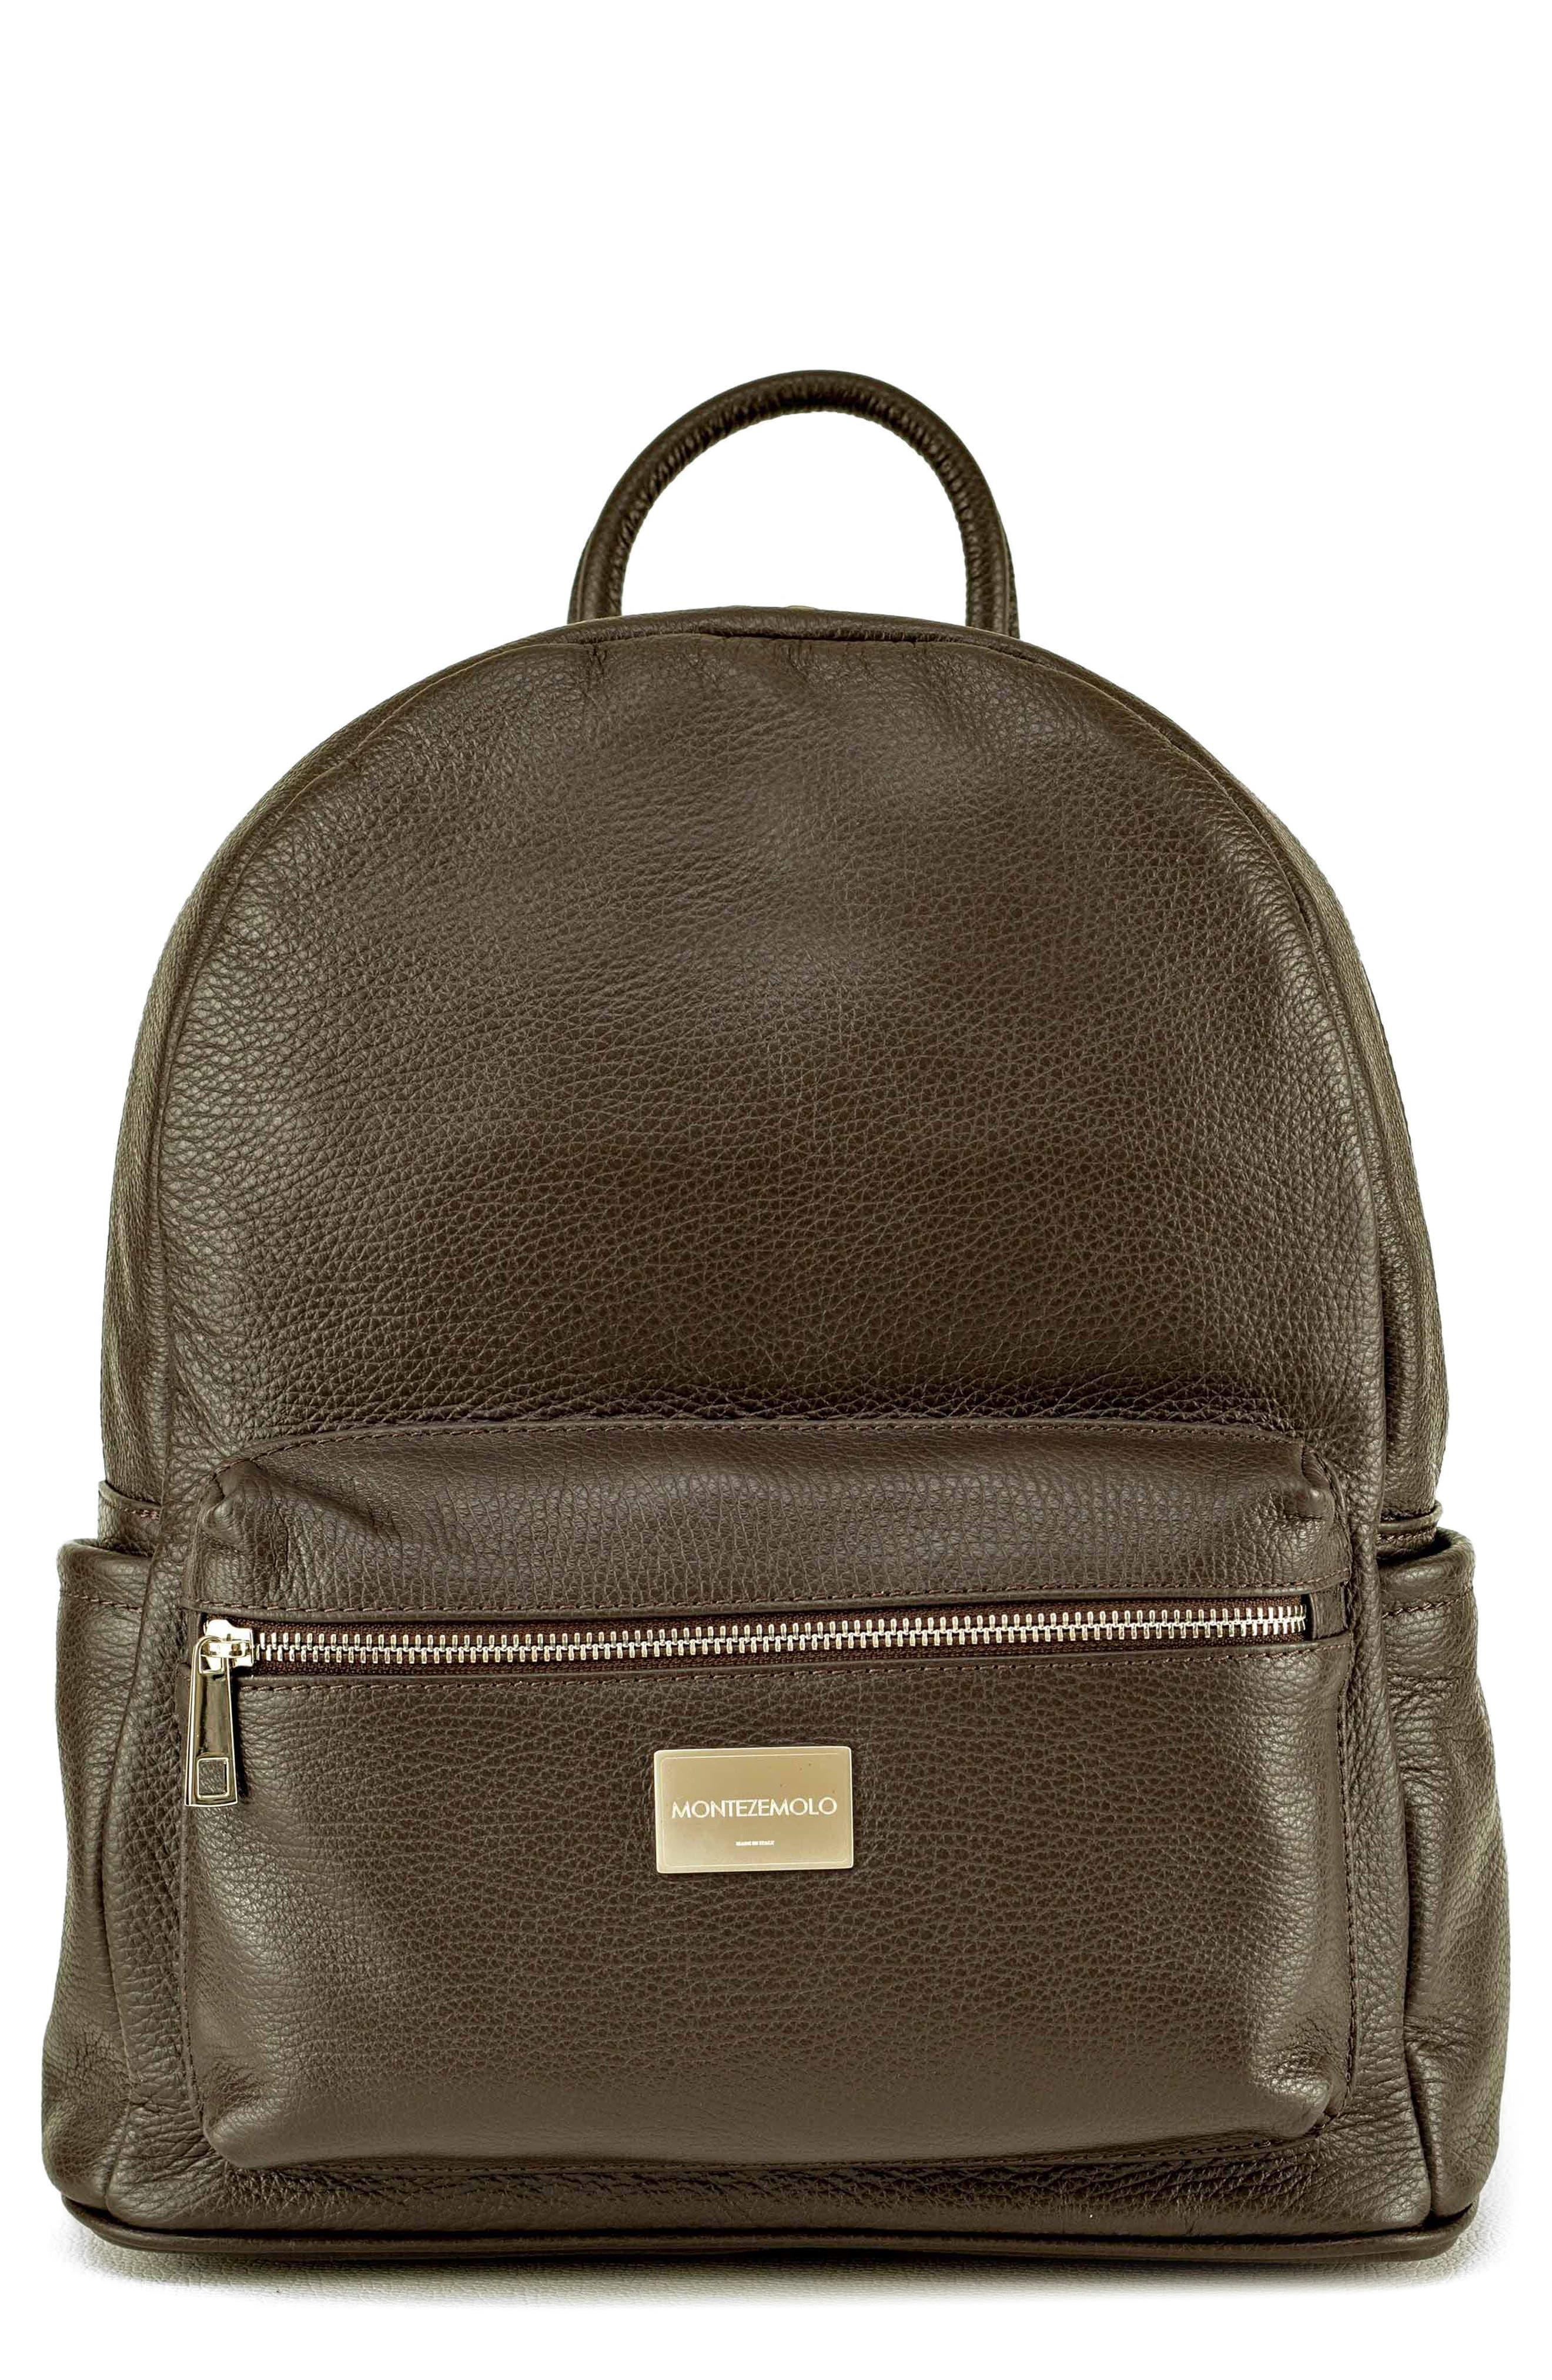 MONTEZEMOLO Leather Backpack - Brown in Marrone